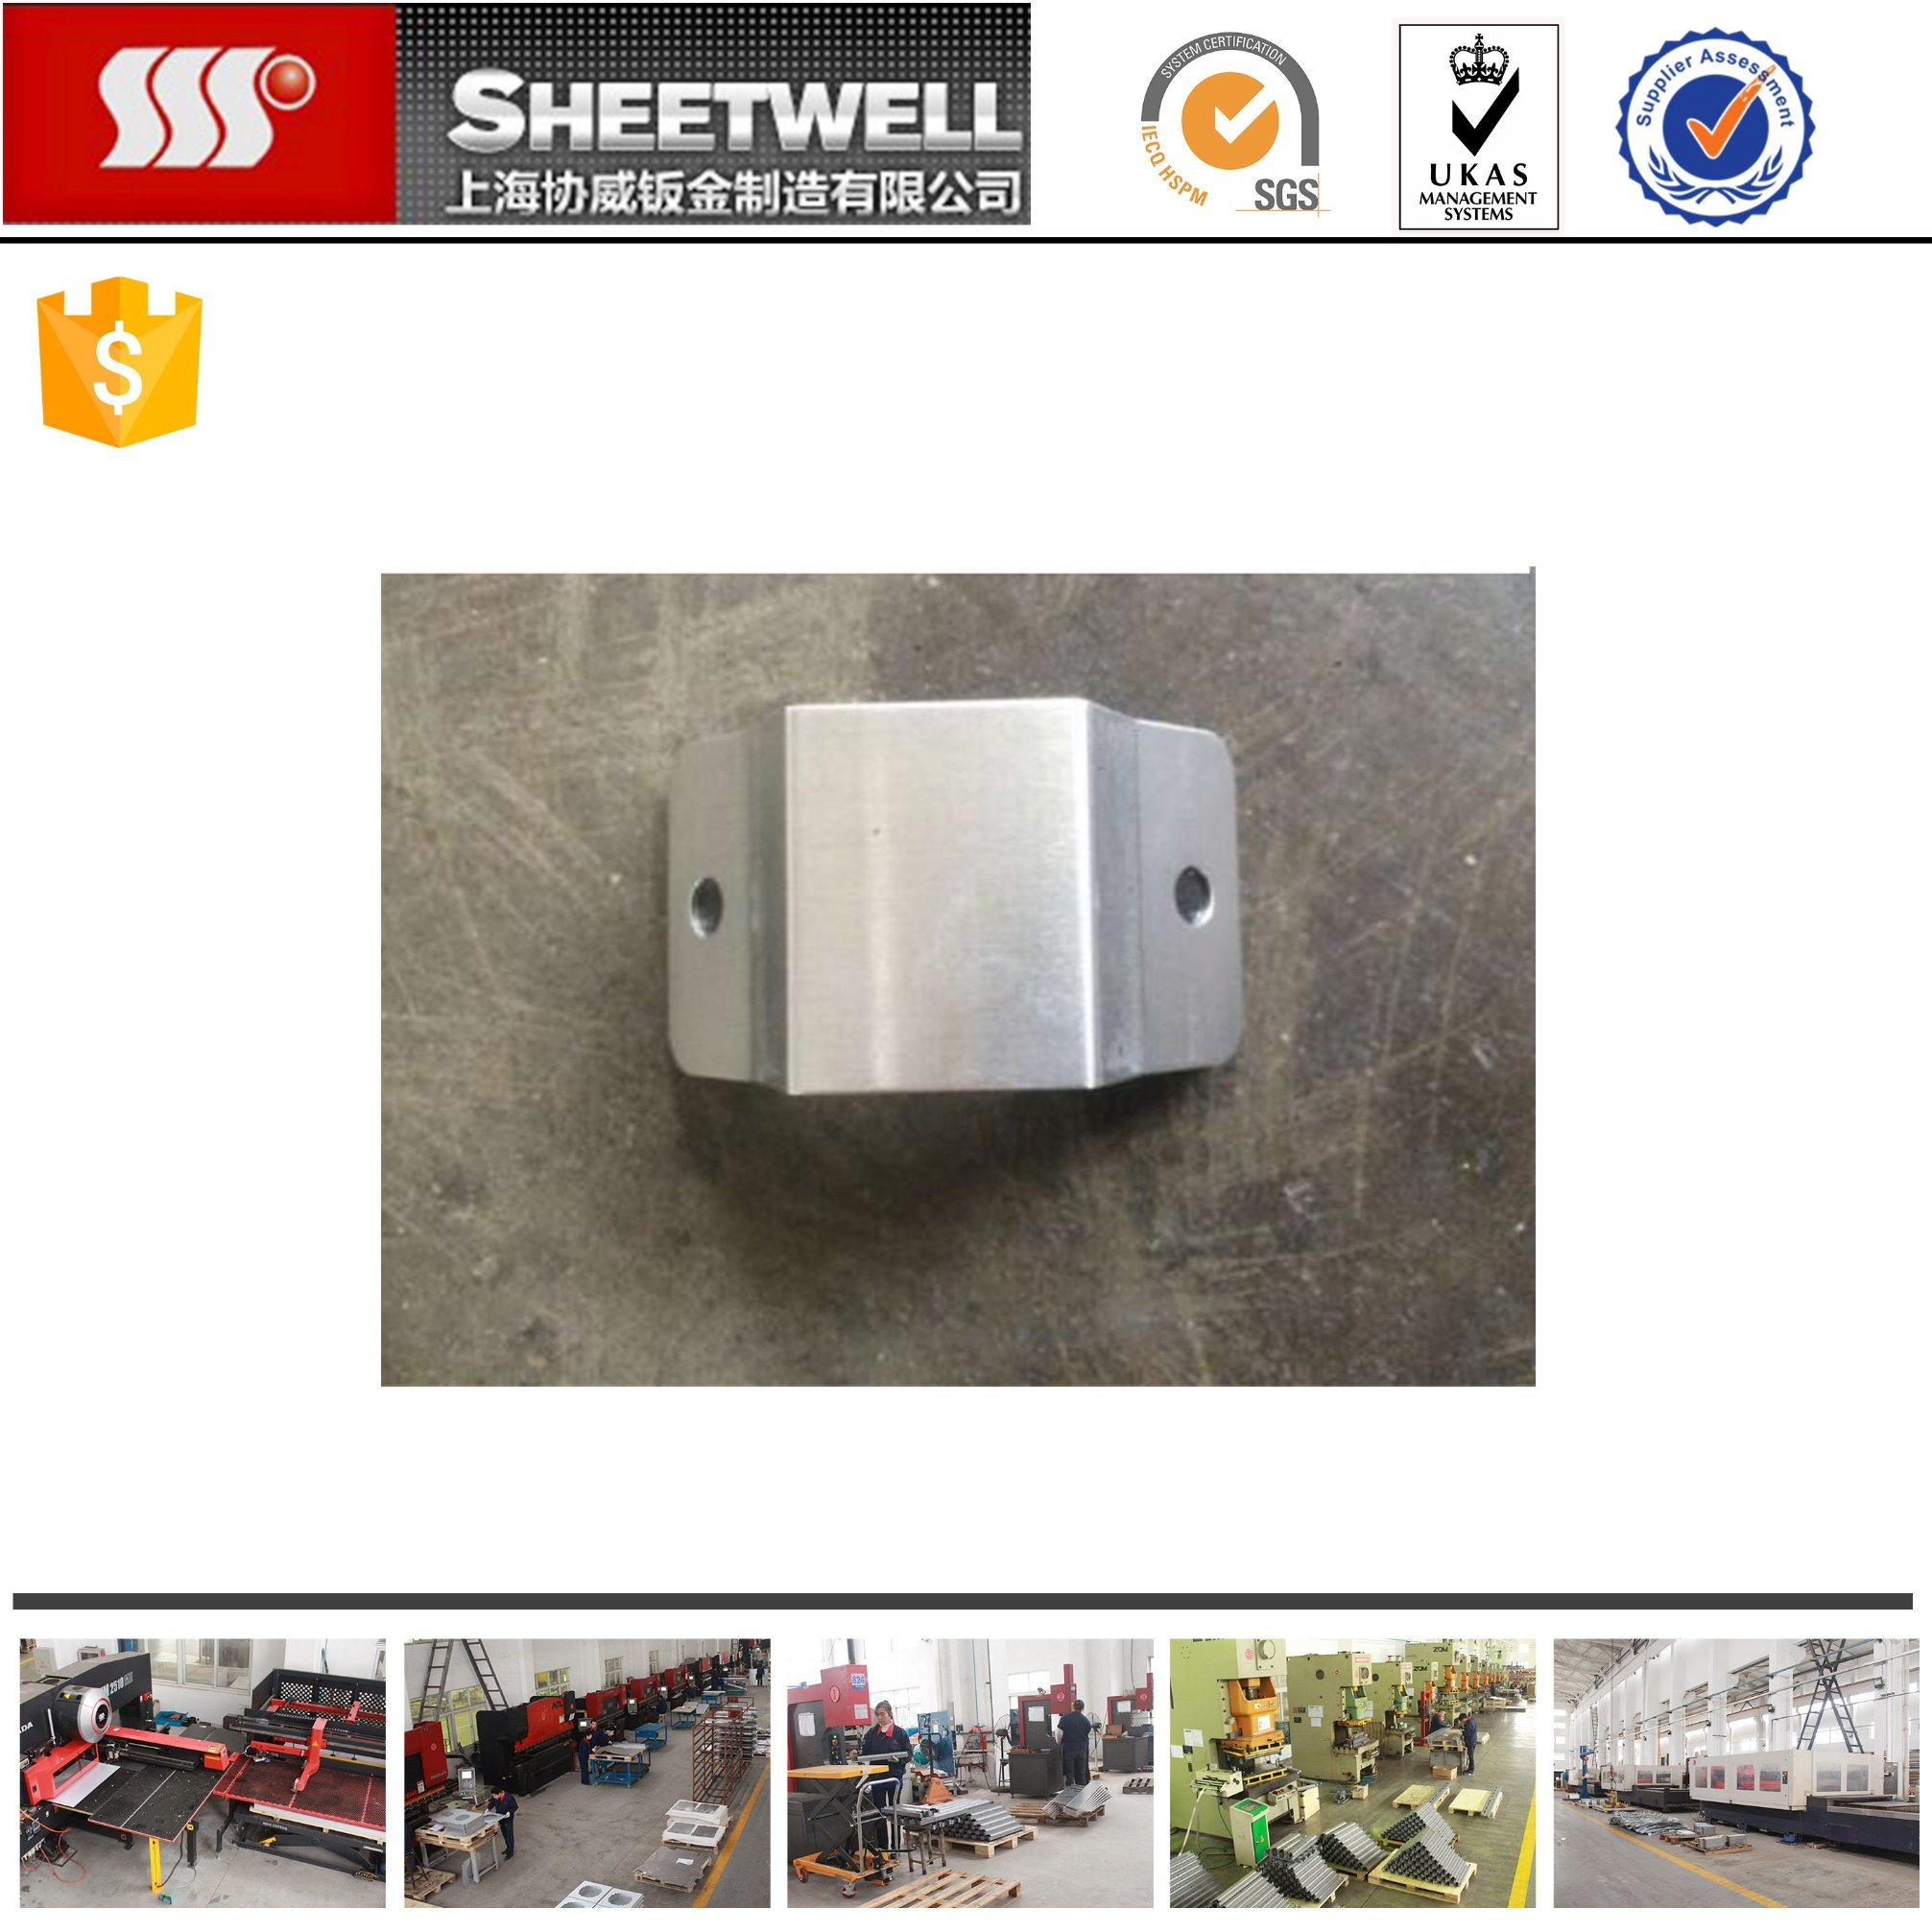 Metal Steel Aluminumm Alloy Construstion Tamped Stamping Hardware